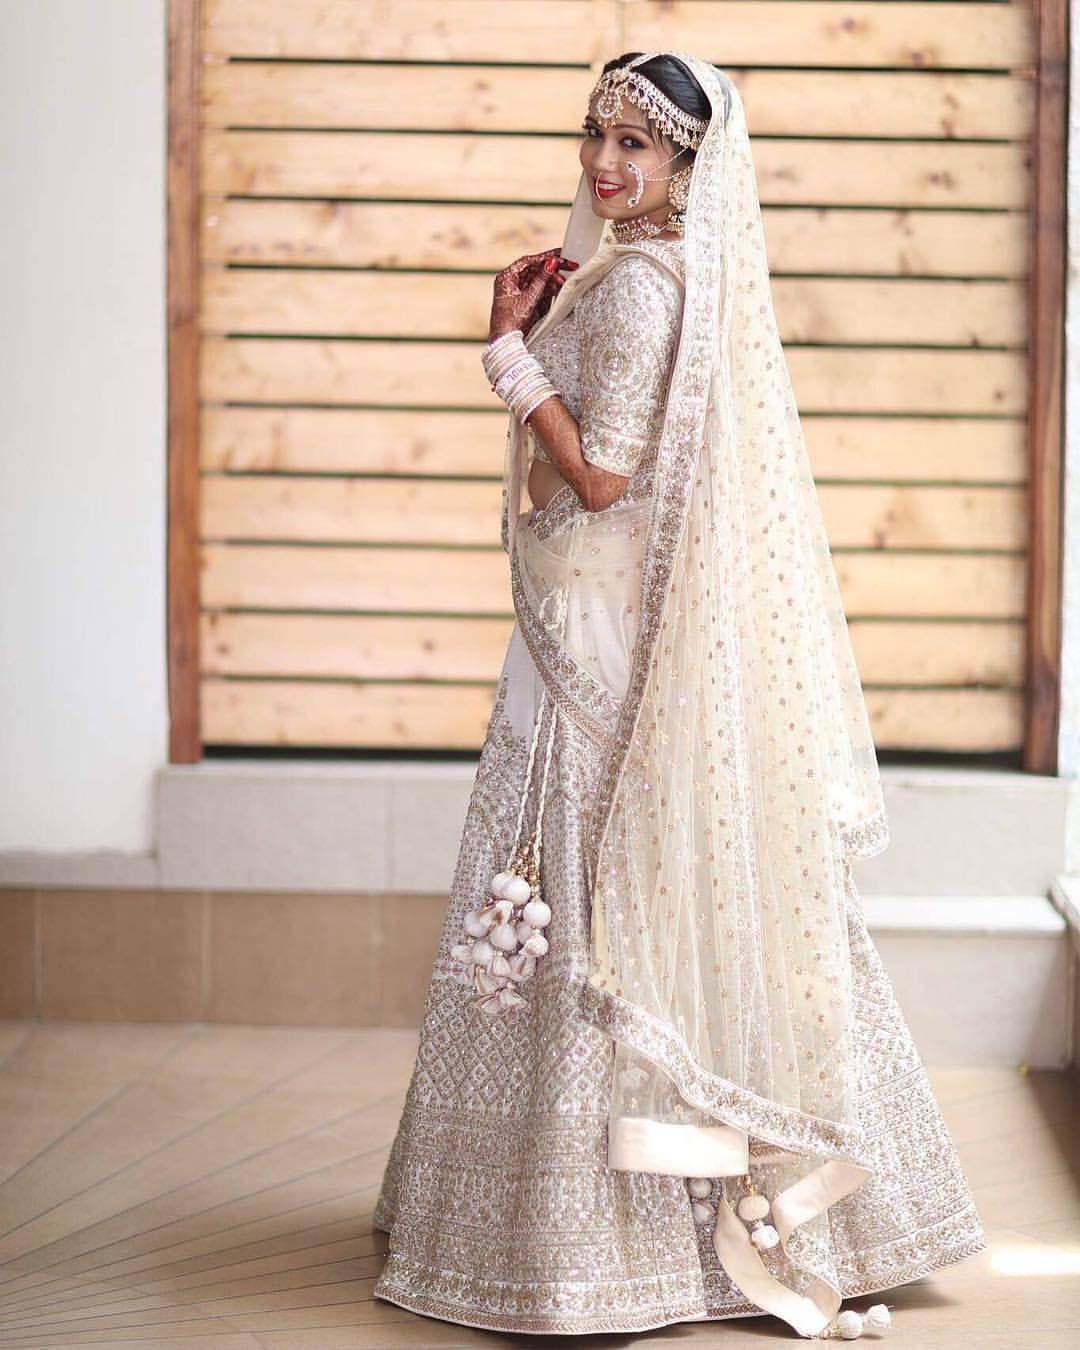 PunjabKesari, white wedding lehenga Image